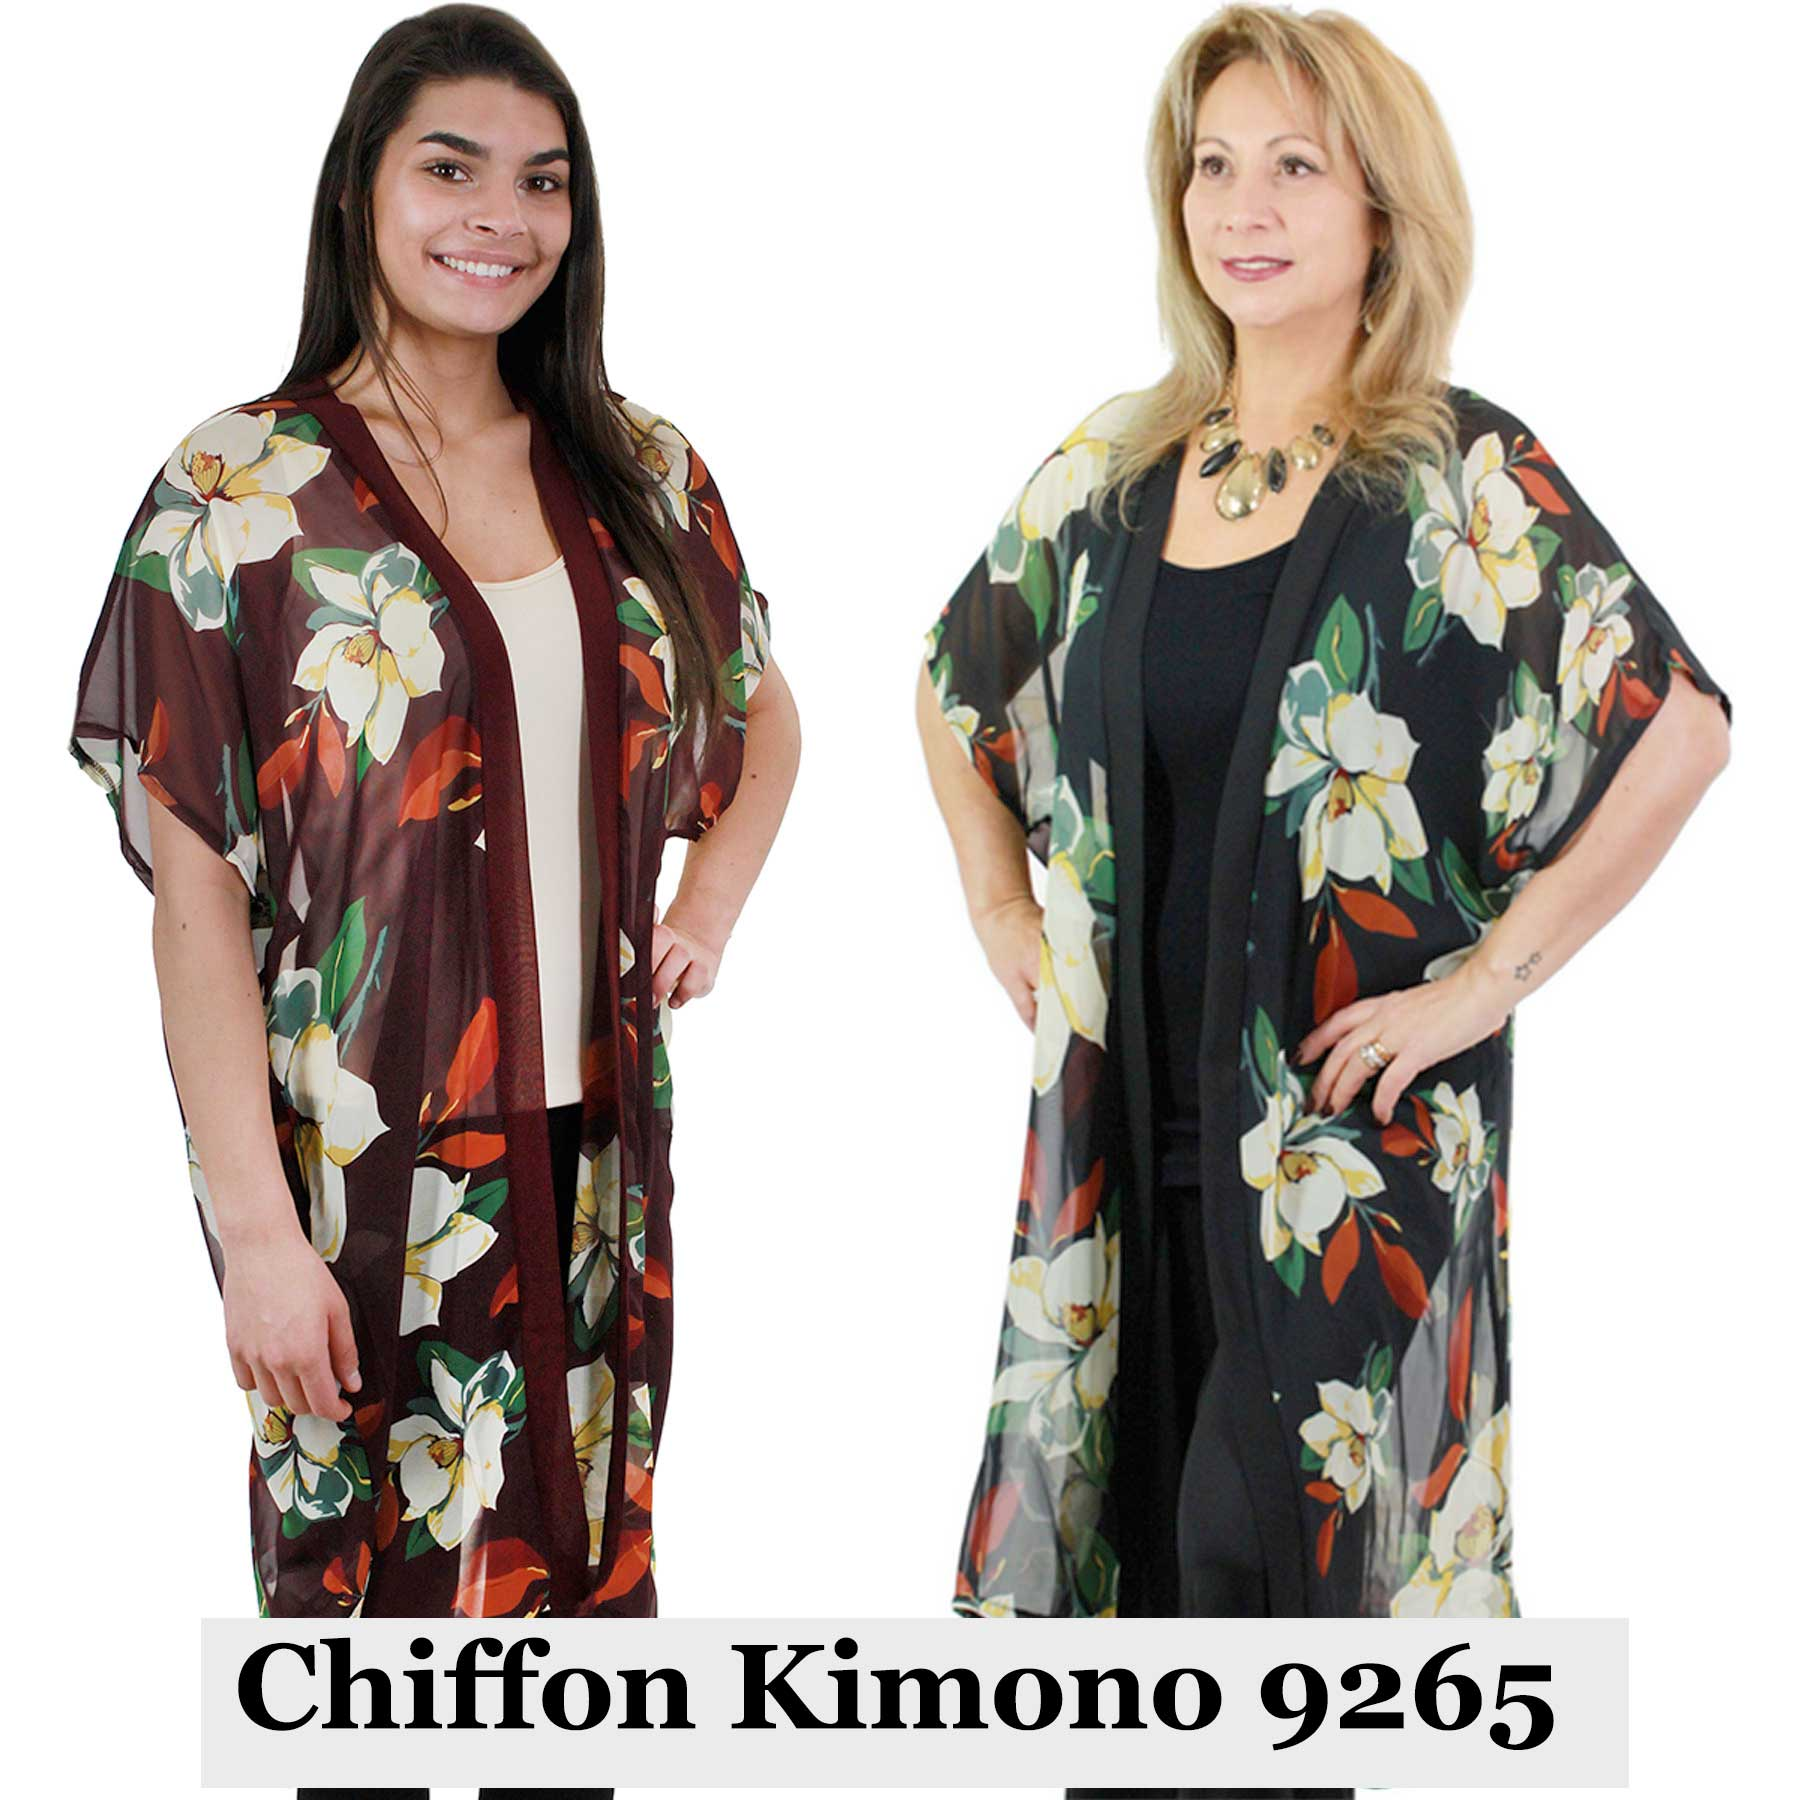 Chiffon Kimono - Flower Print 9265